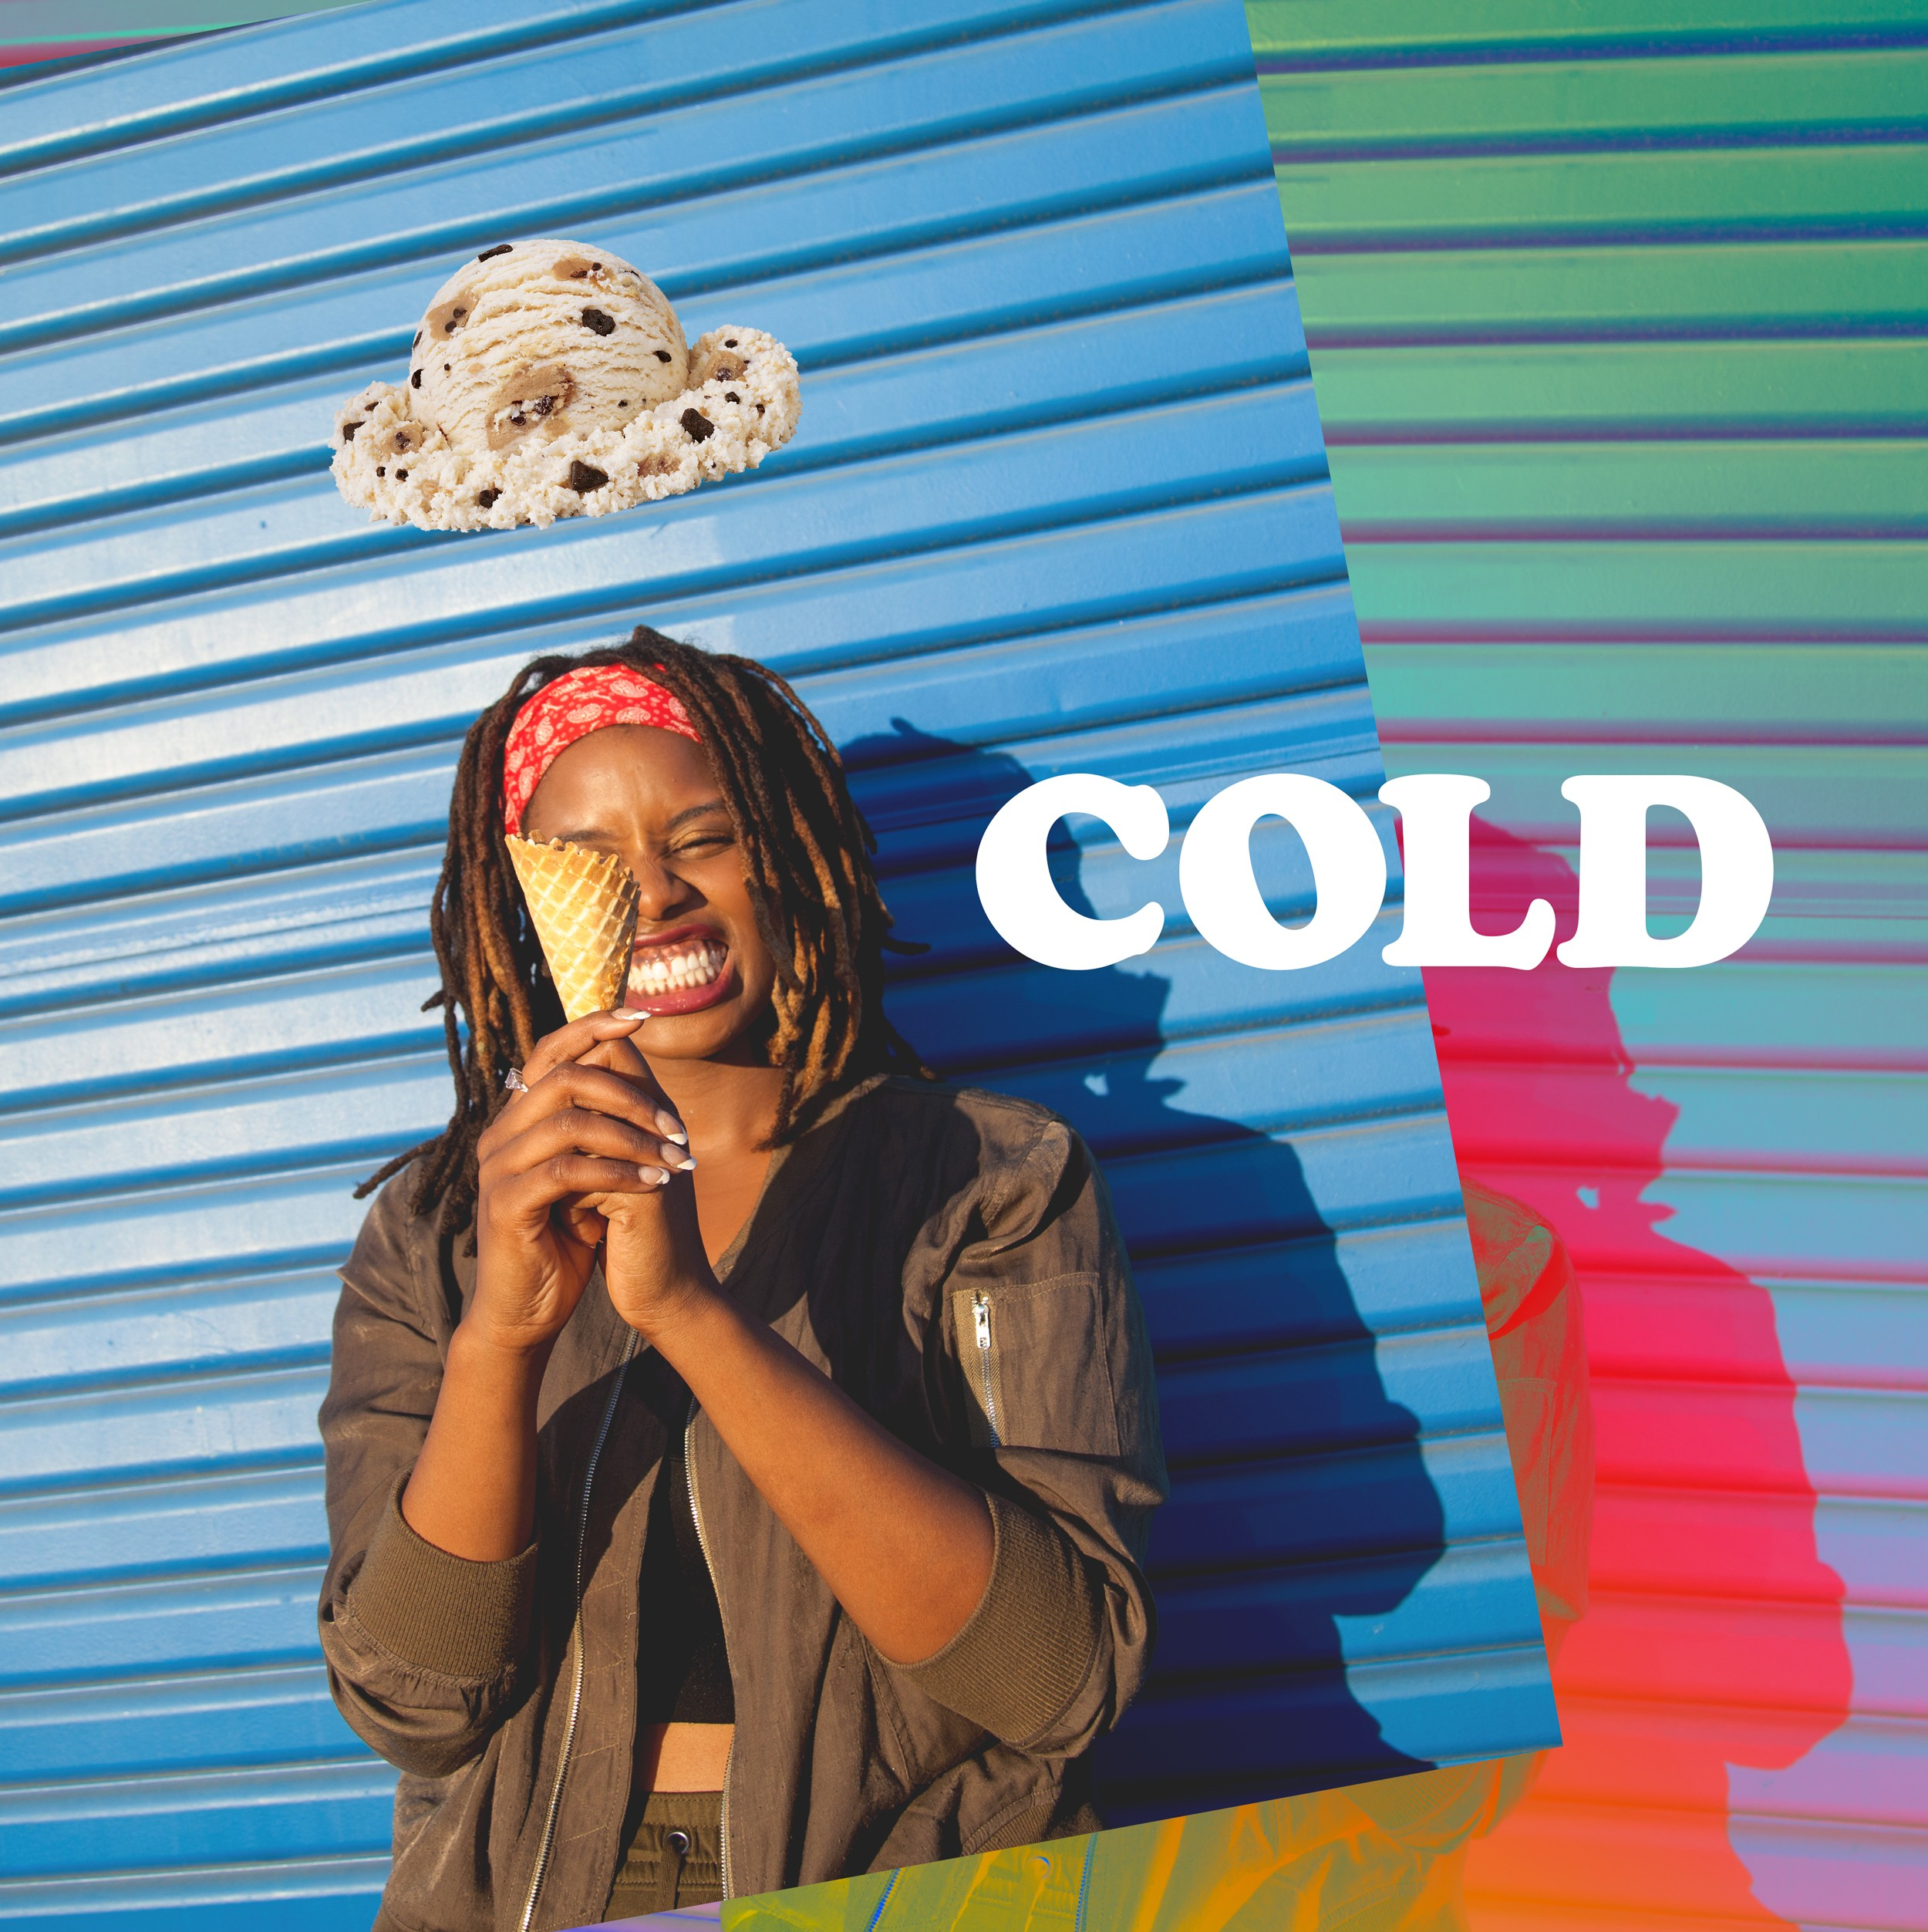 COLD-1.0-2